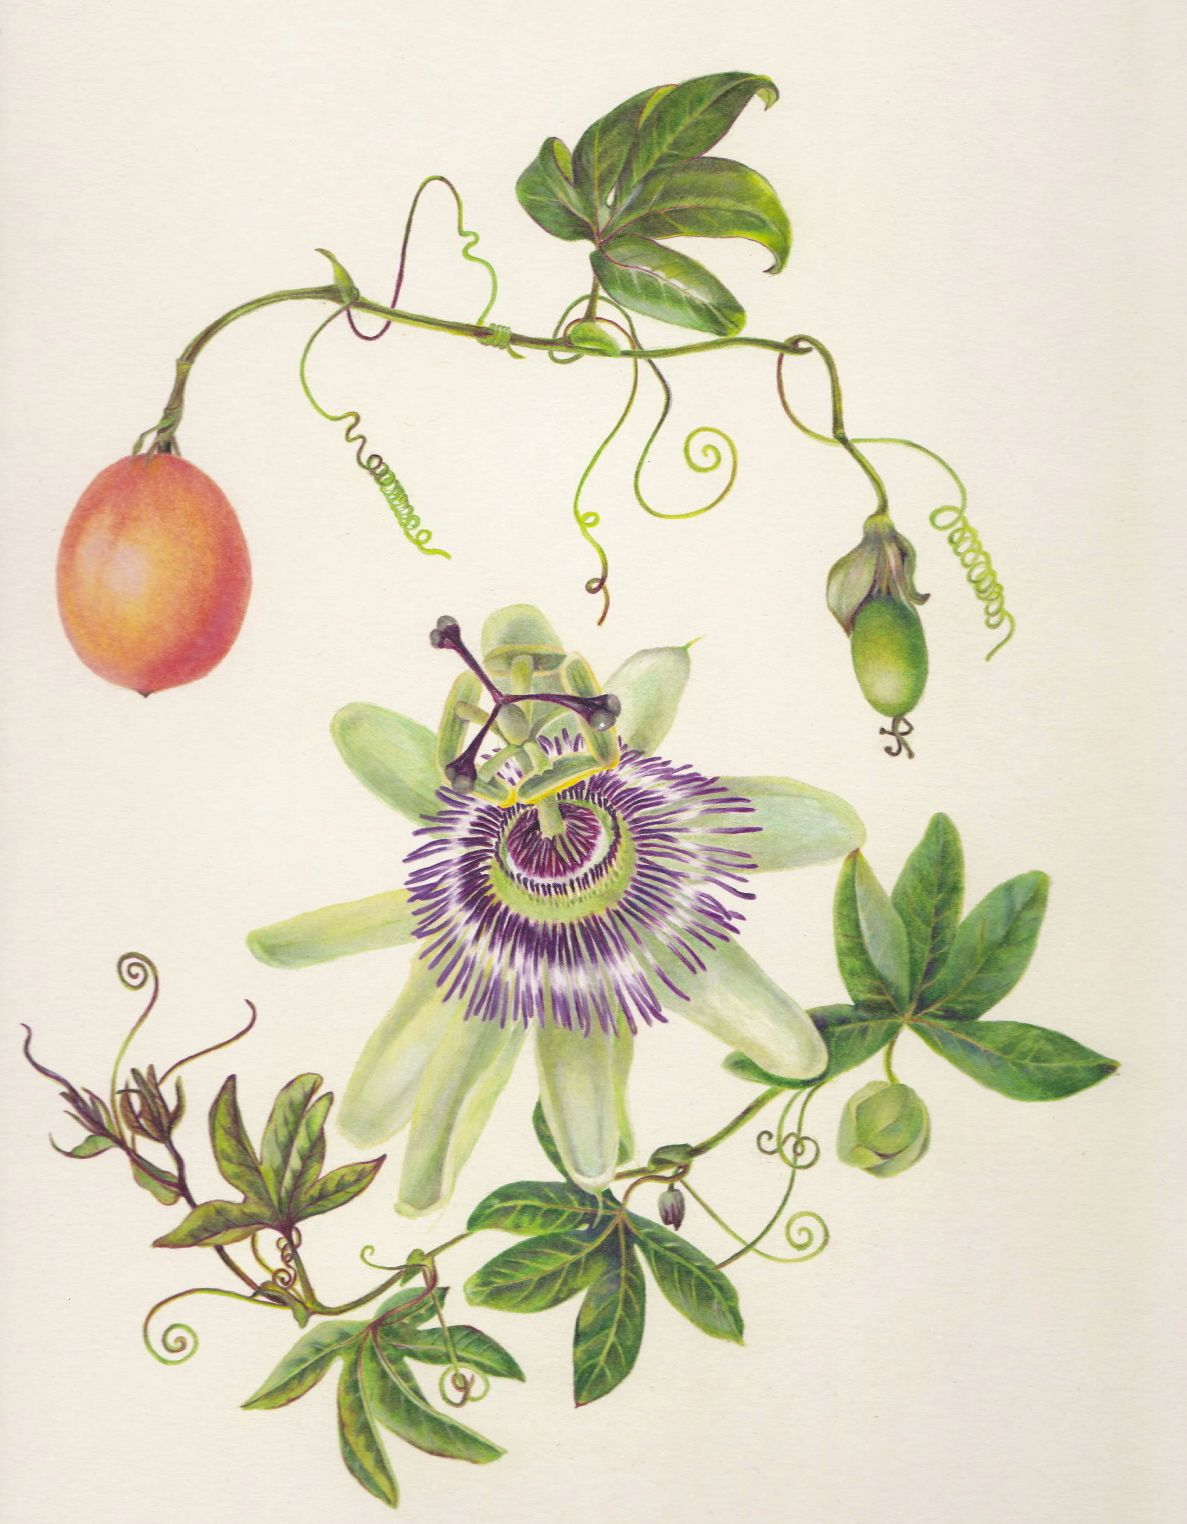 Passion Flower Botanical Illustration Google Search 花 イラスト イラスト 水彩